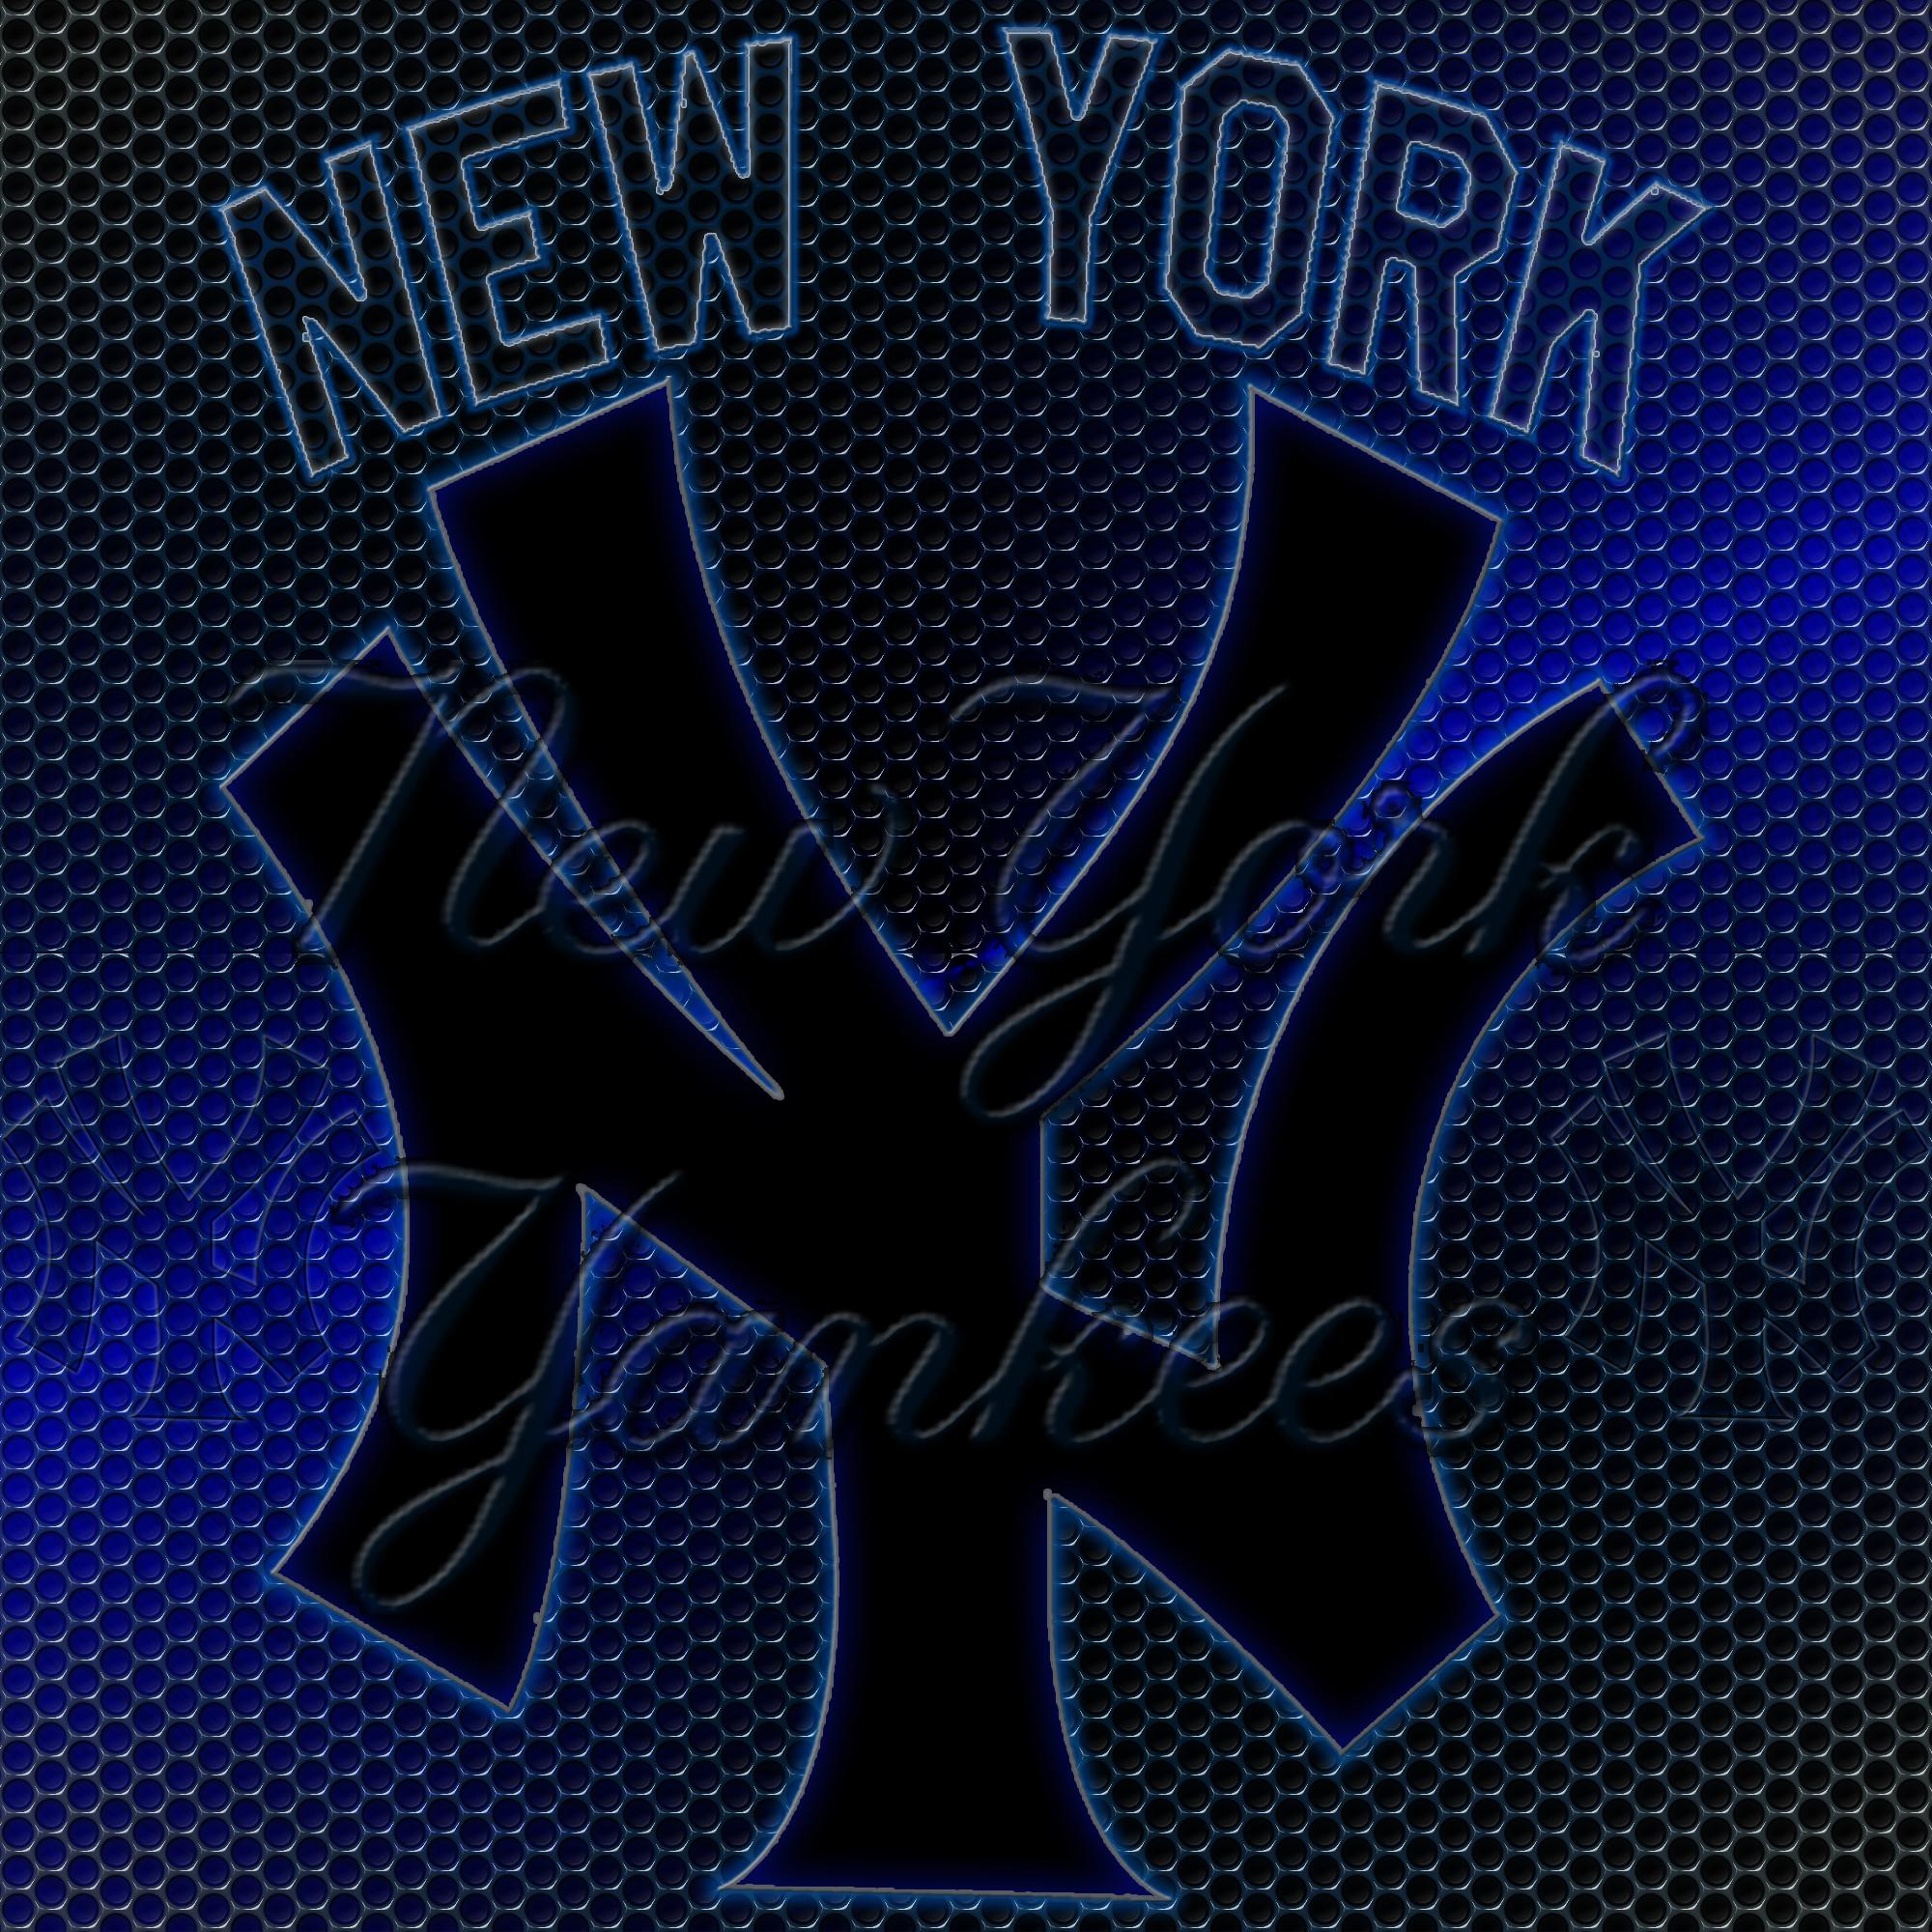 67+ Ny Yankees Logo Wallpaper on WallpaperSafari